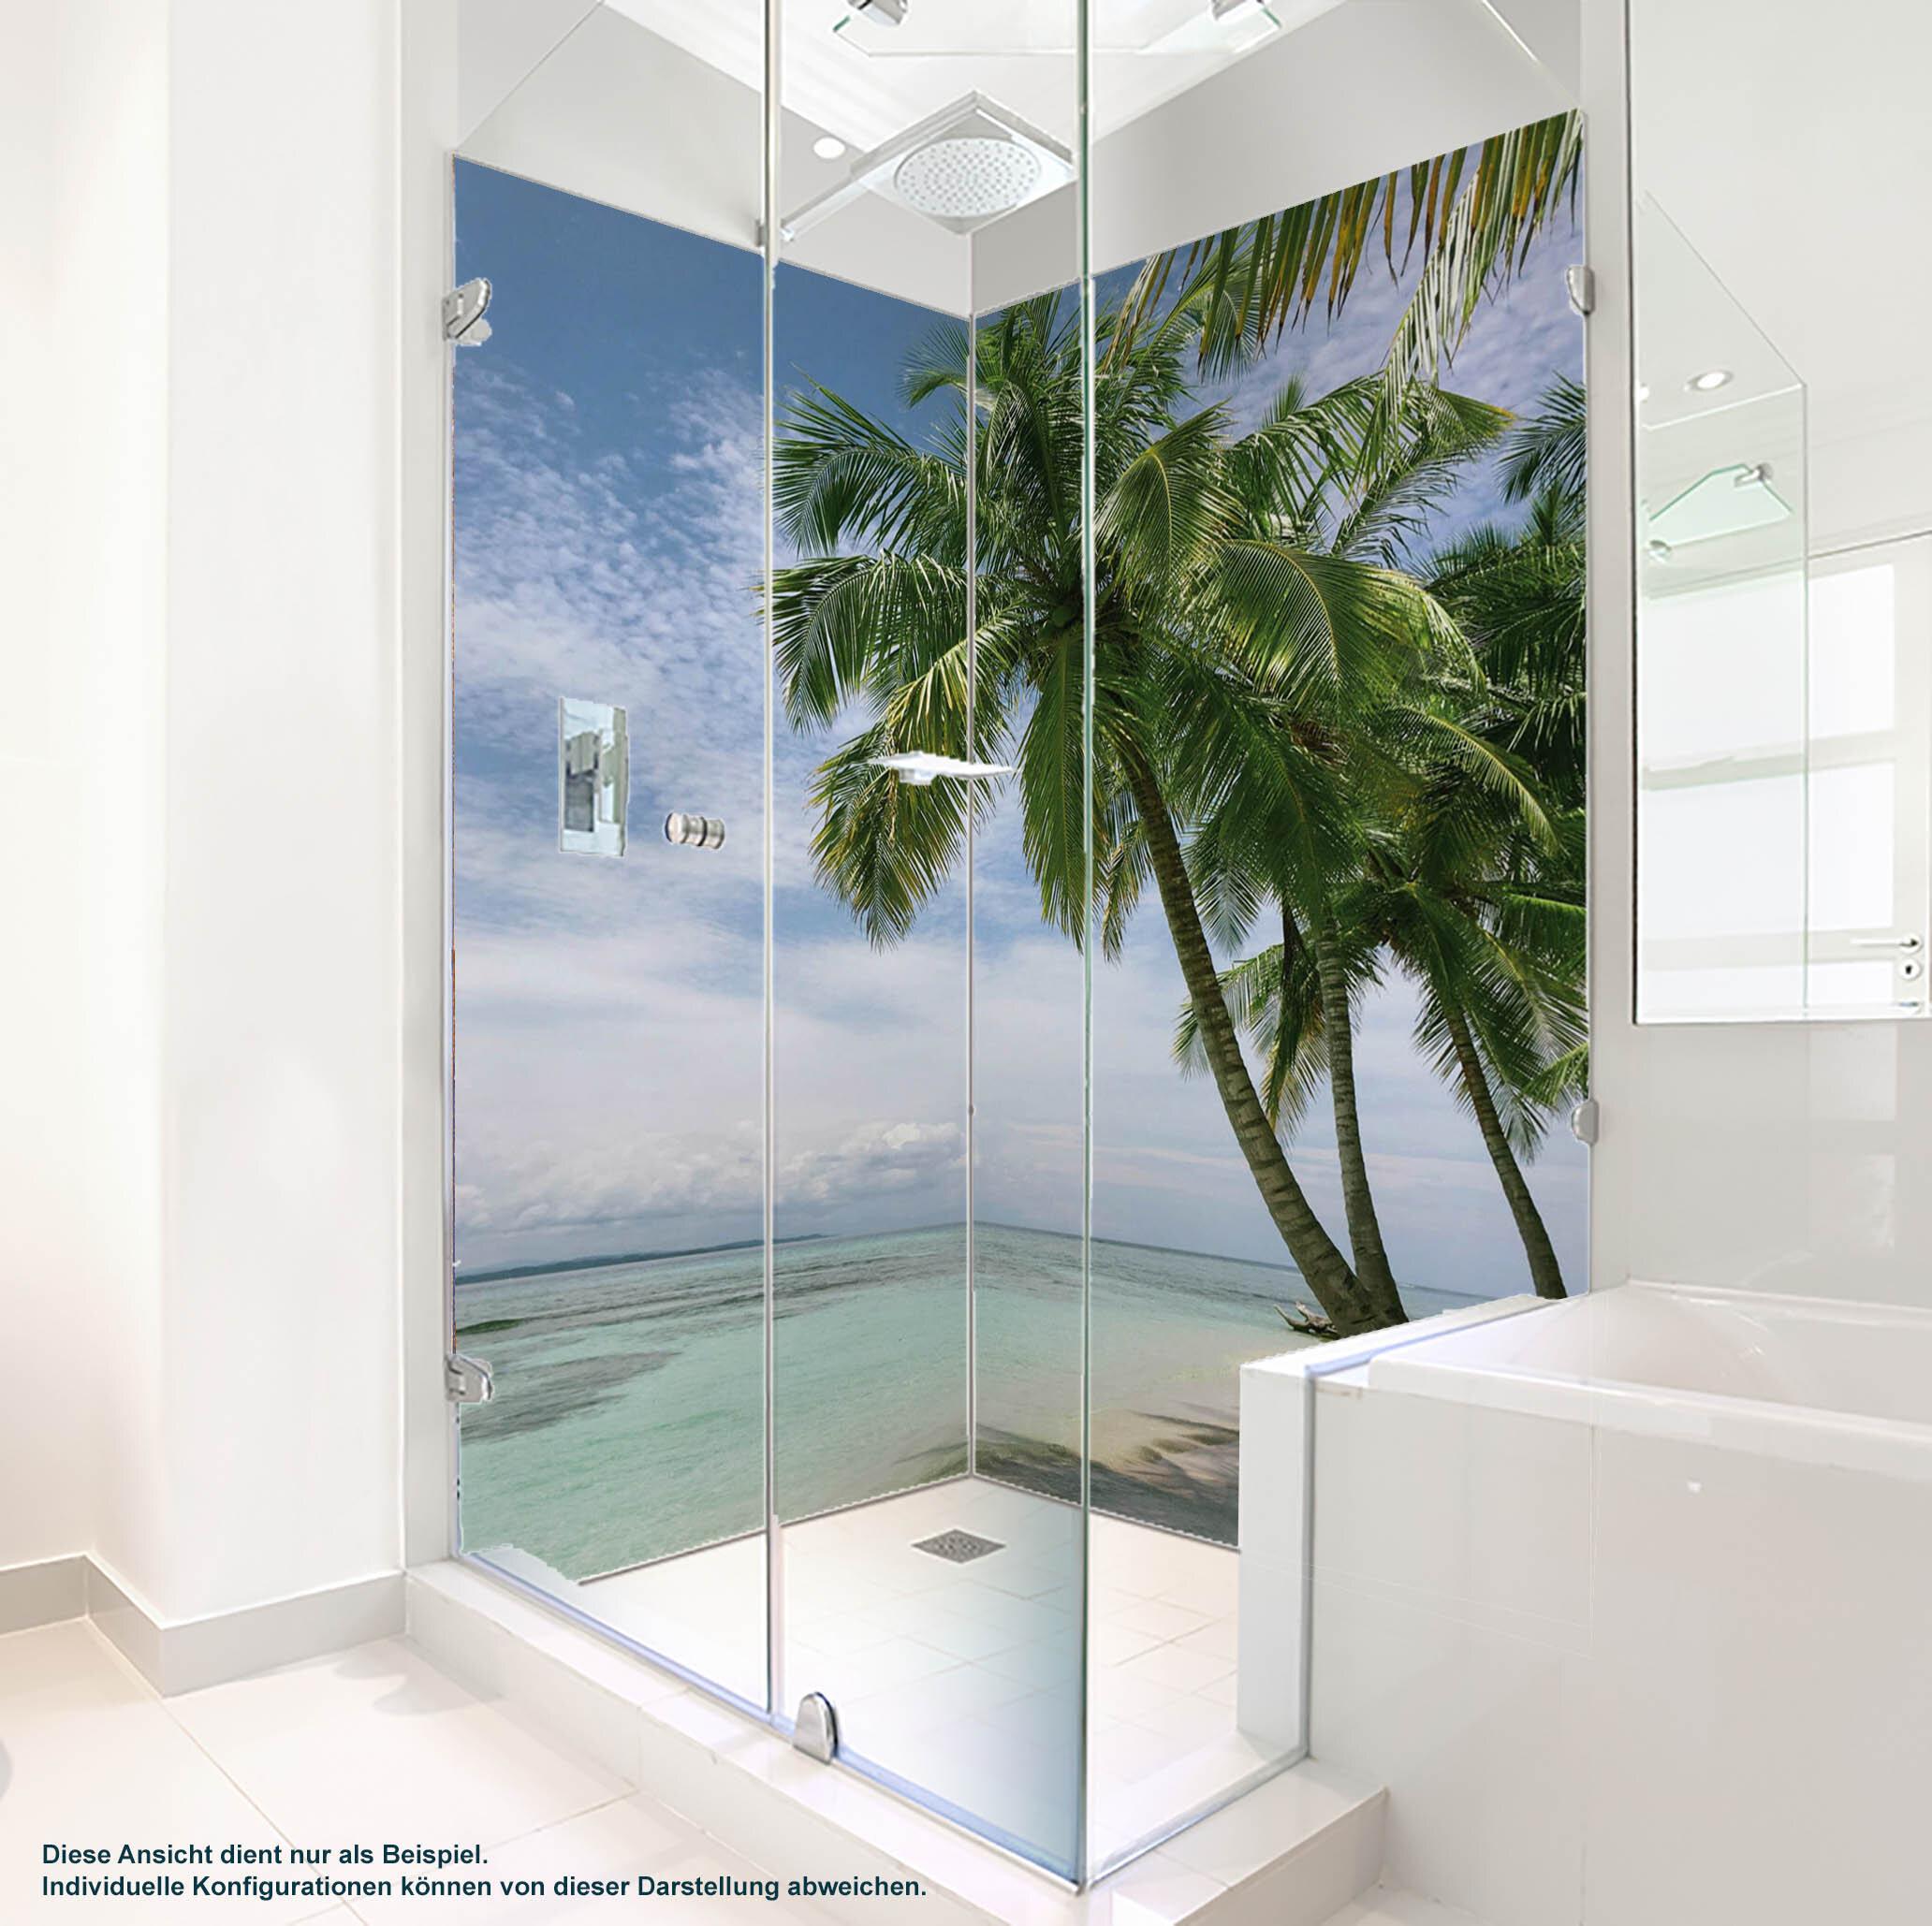 Dusche PlateART Duschrückwand mit Motiv Strand und Meer K_15_20